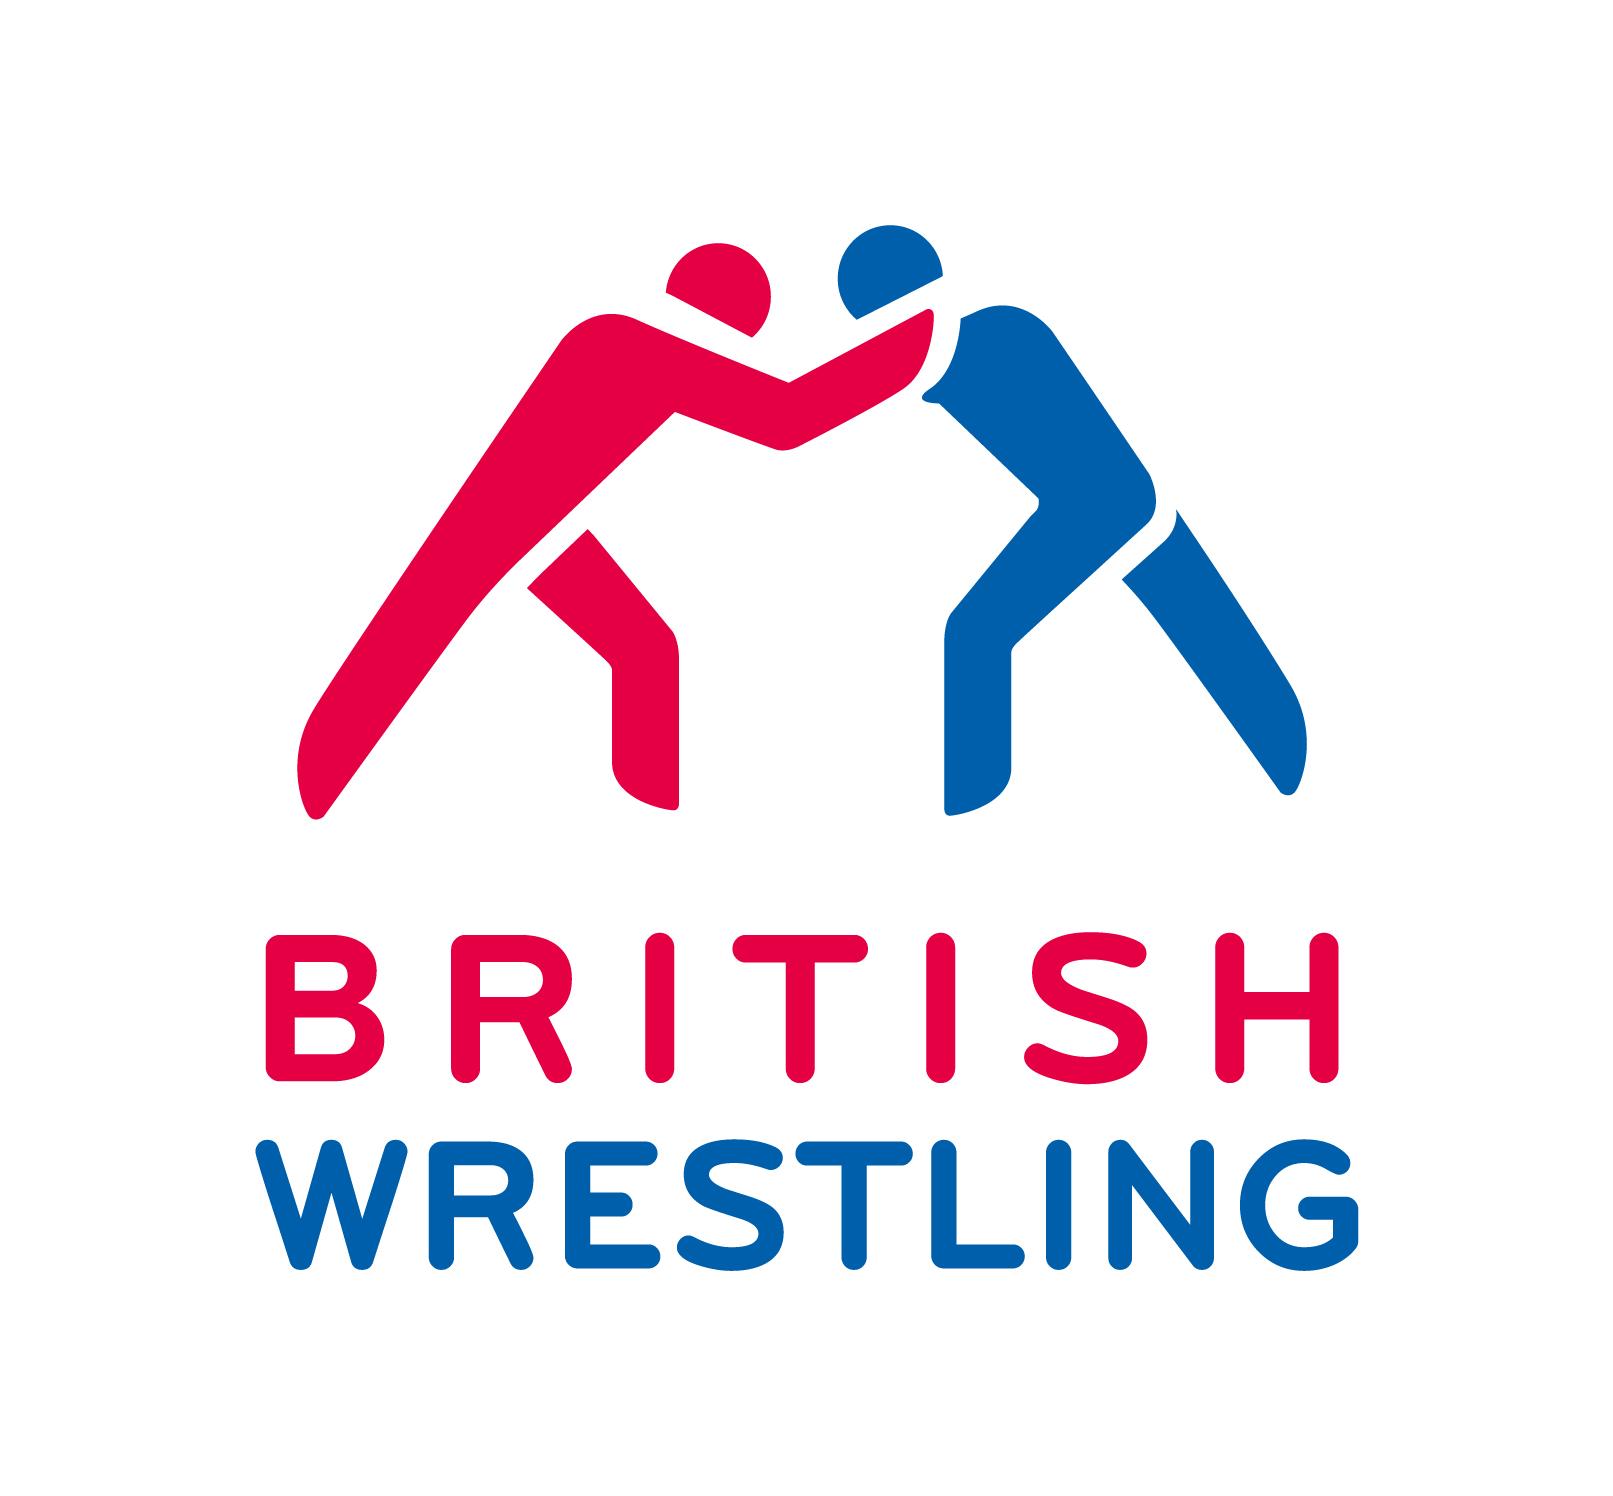 British Wrestling